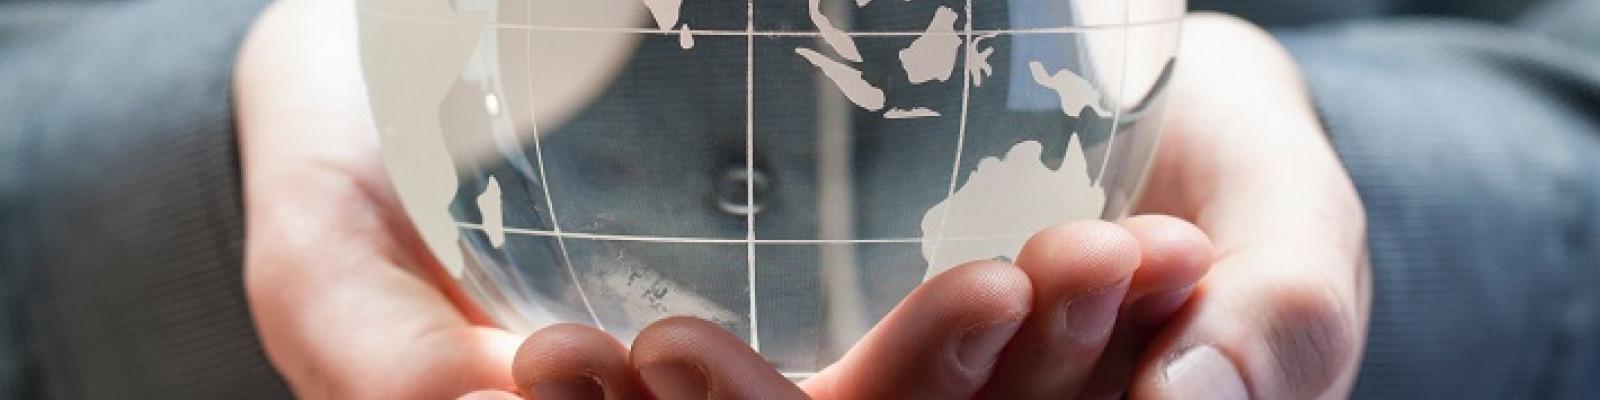 Translucent globe in hands image by Bill Oxford/Unsplash